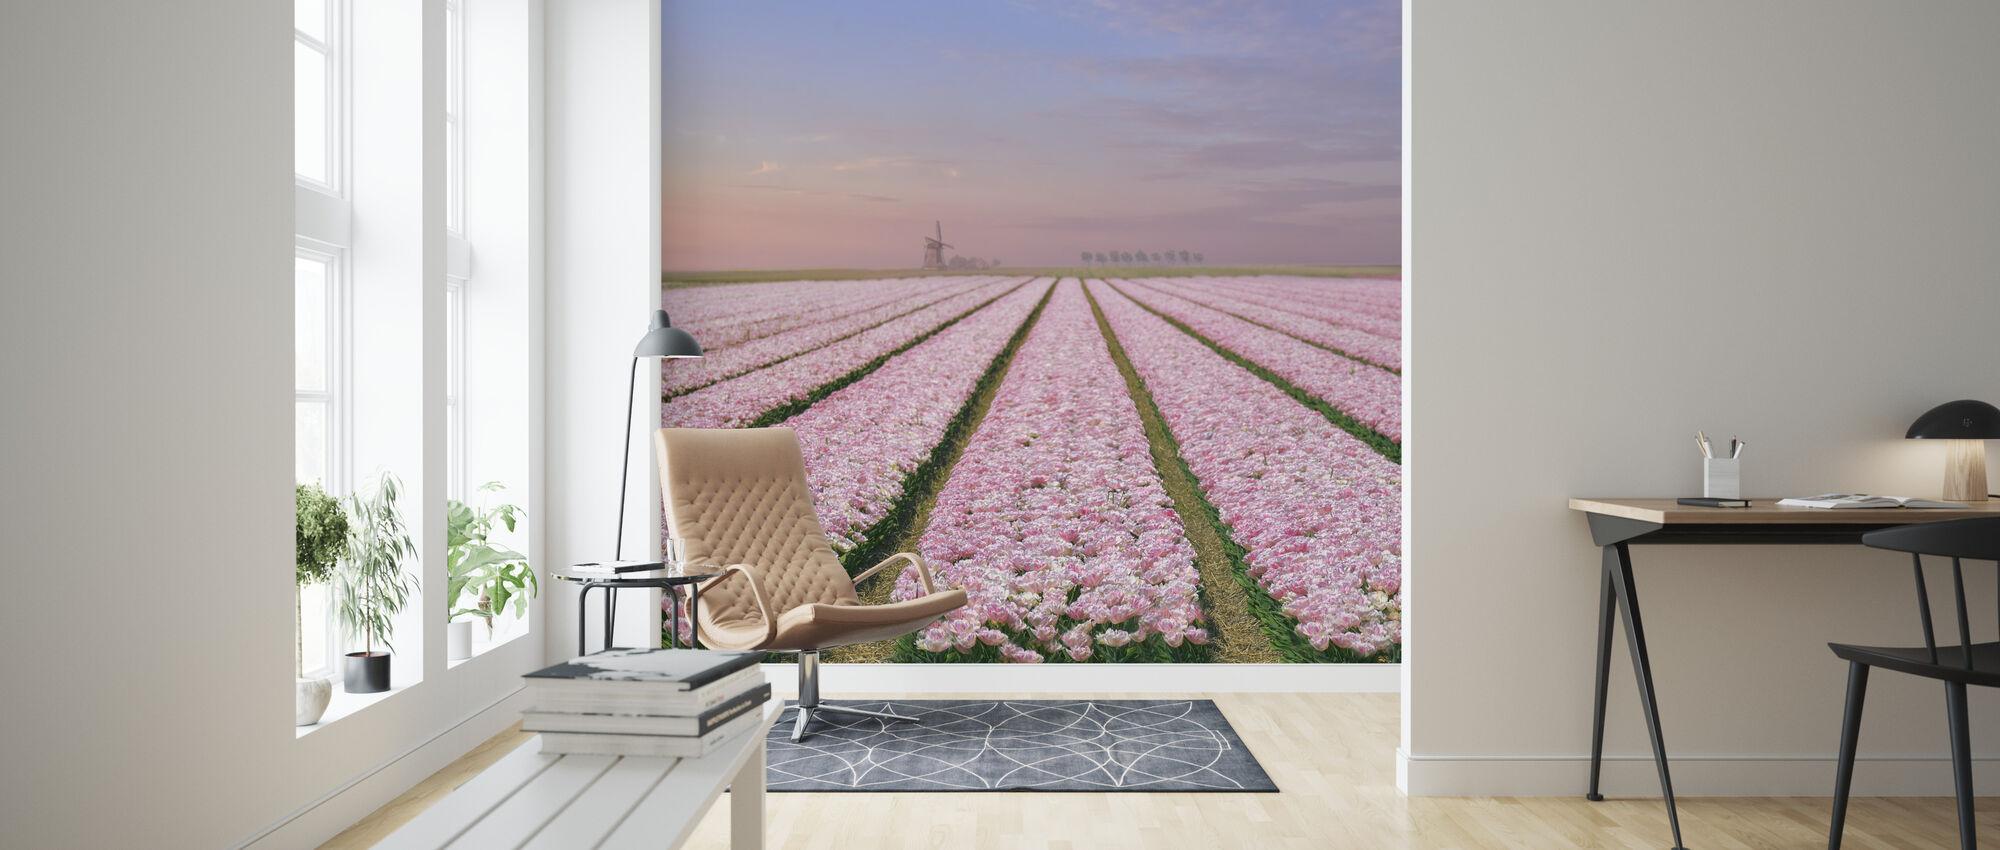 Tulip Fields - Wallpaper - Living Room